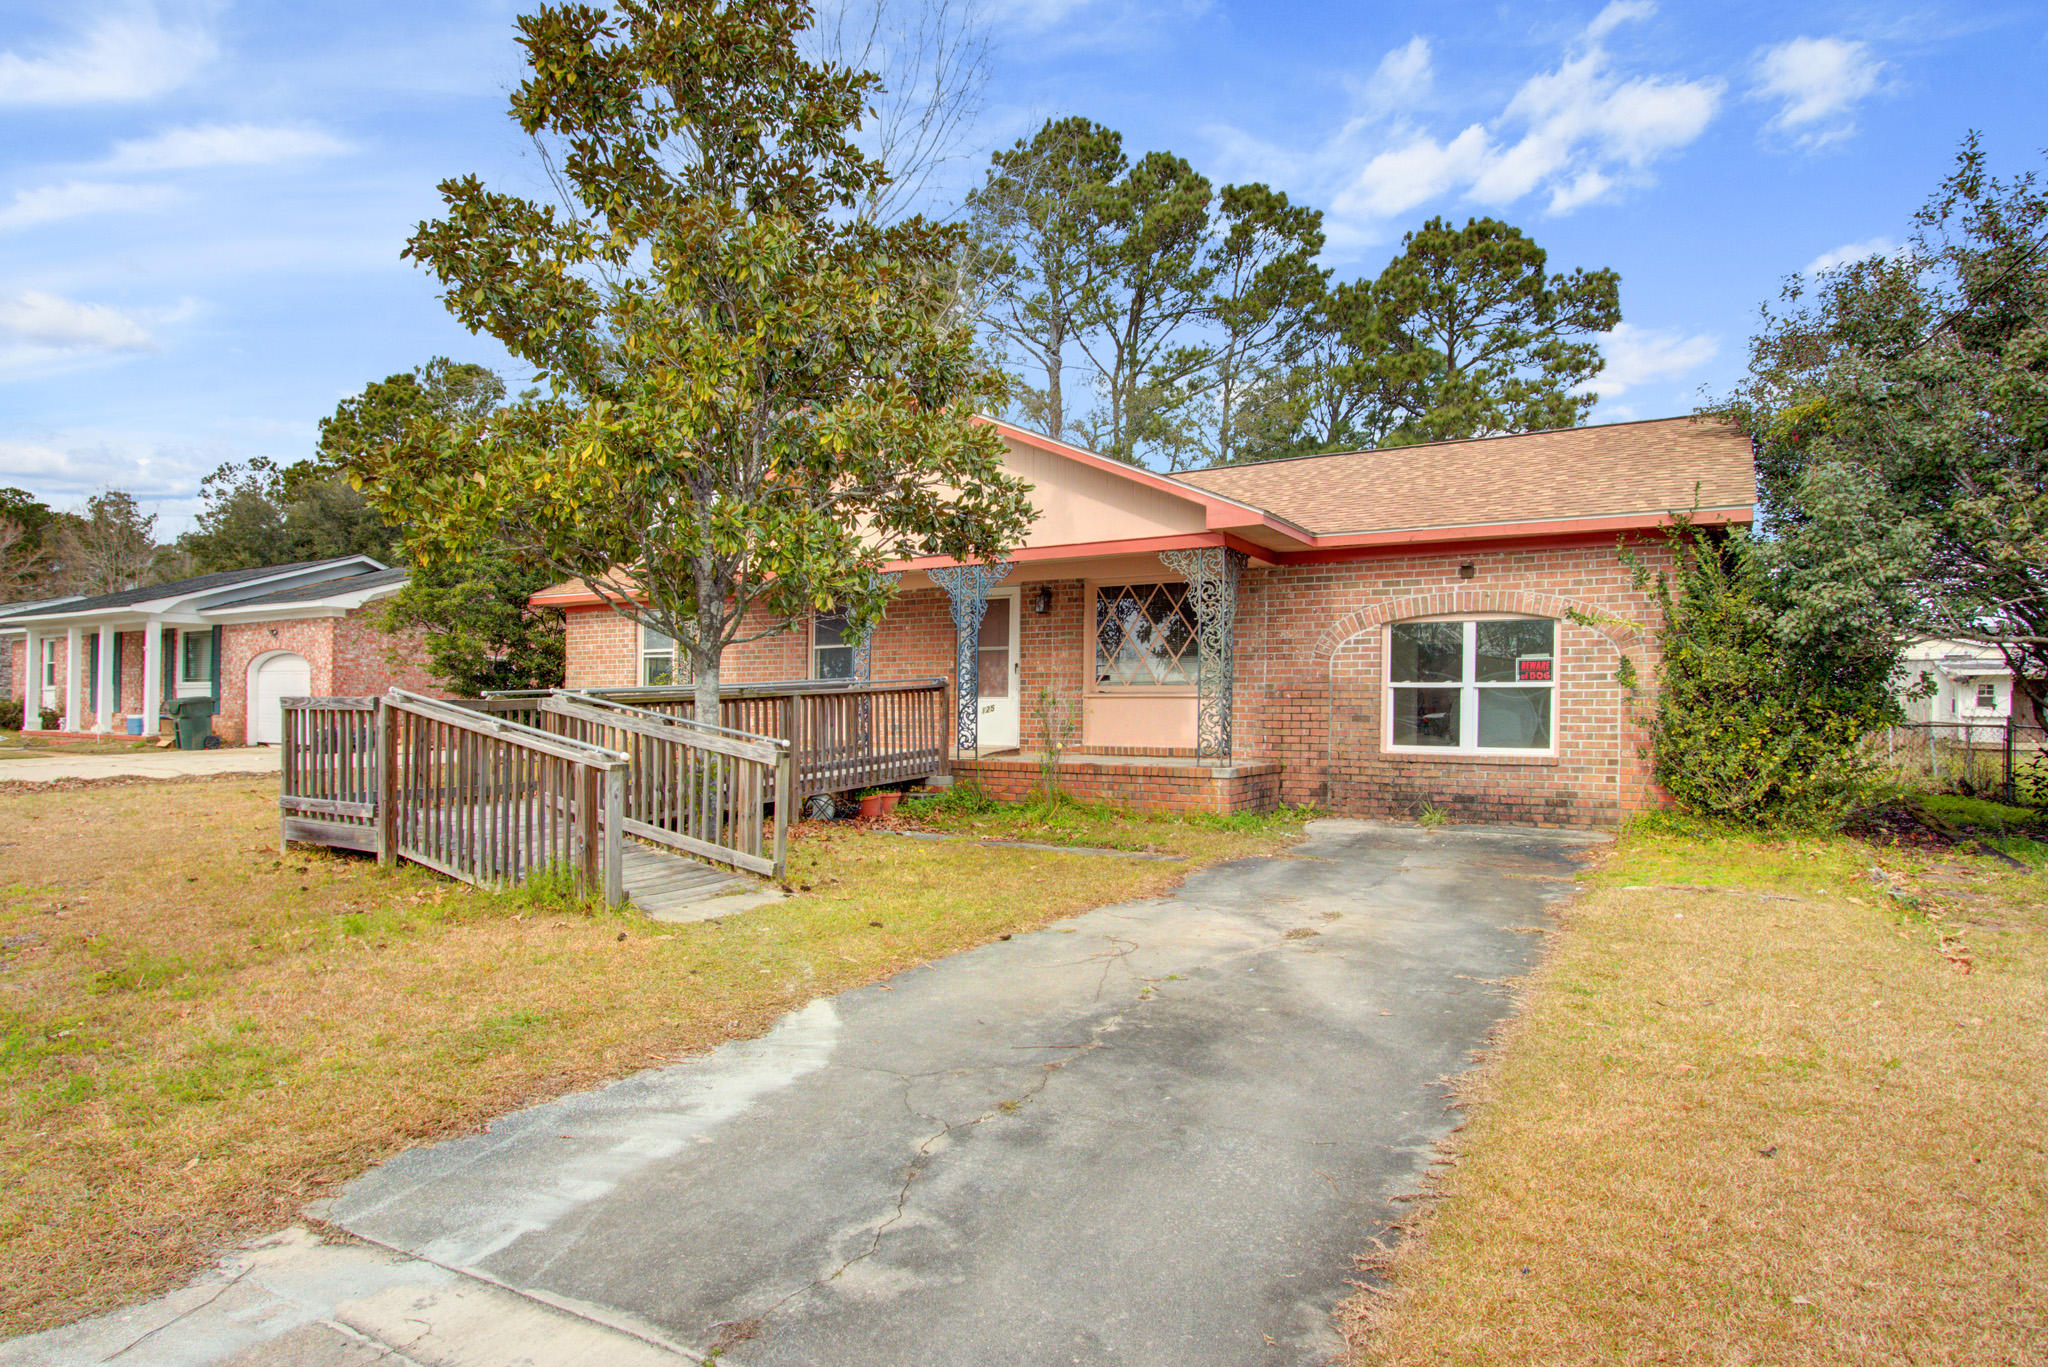 Bushy Park Terrace Homes For Sale - 125 Azalea, Goose Creek, SC - 2